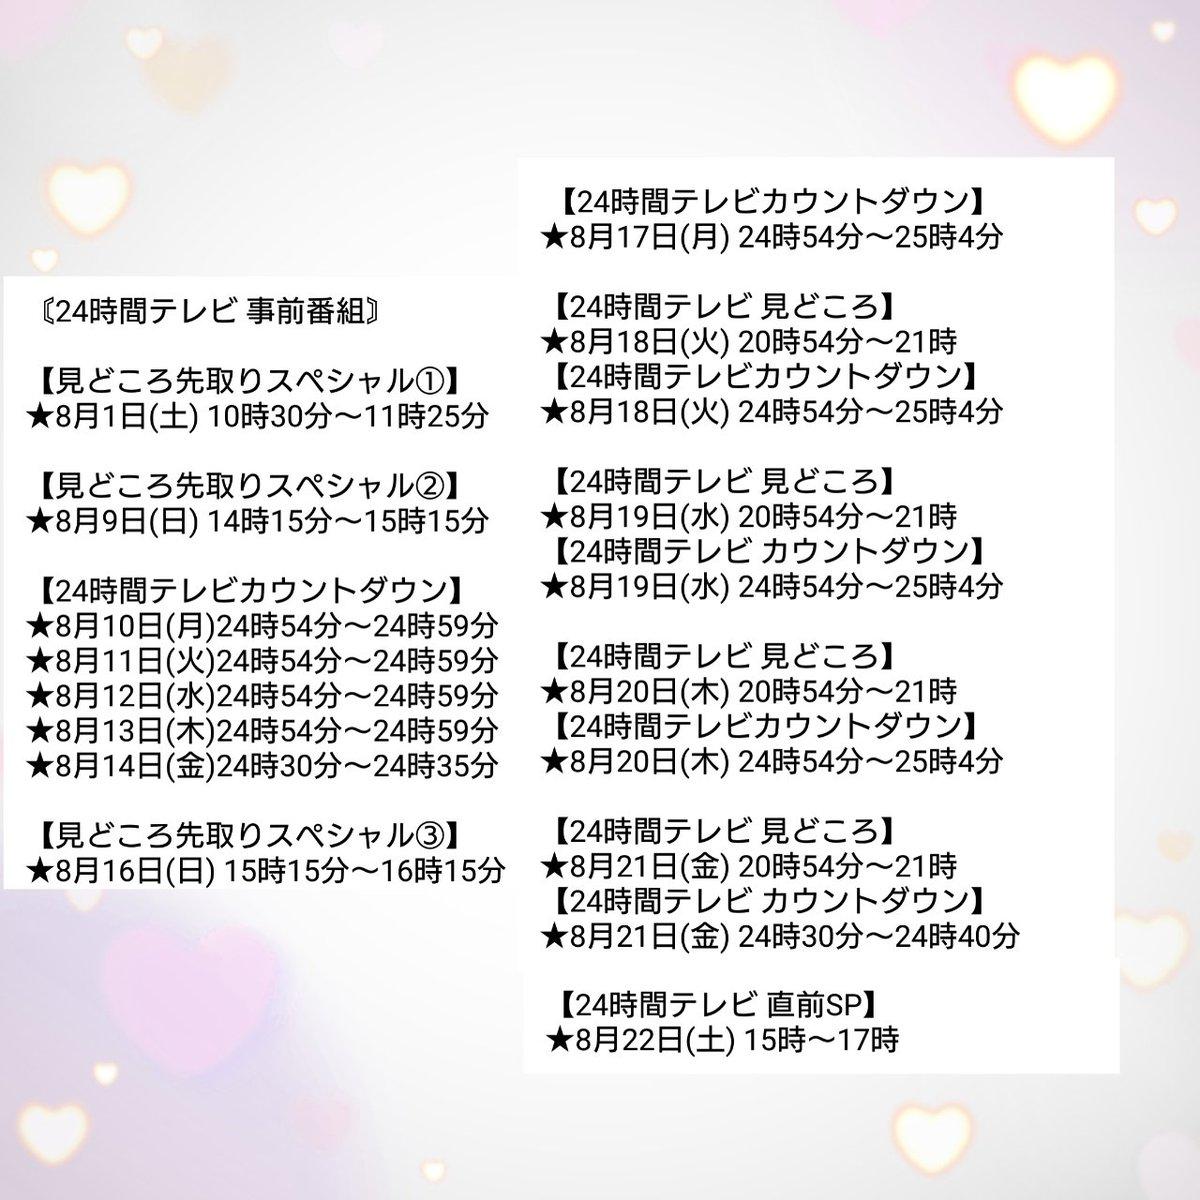 重岡 毅 24 時間 テレビ 大